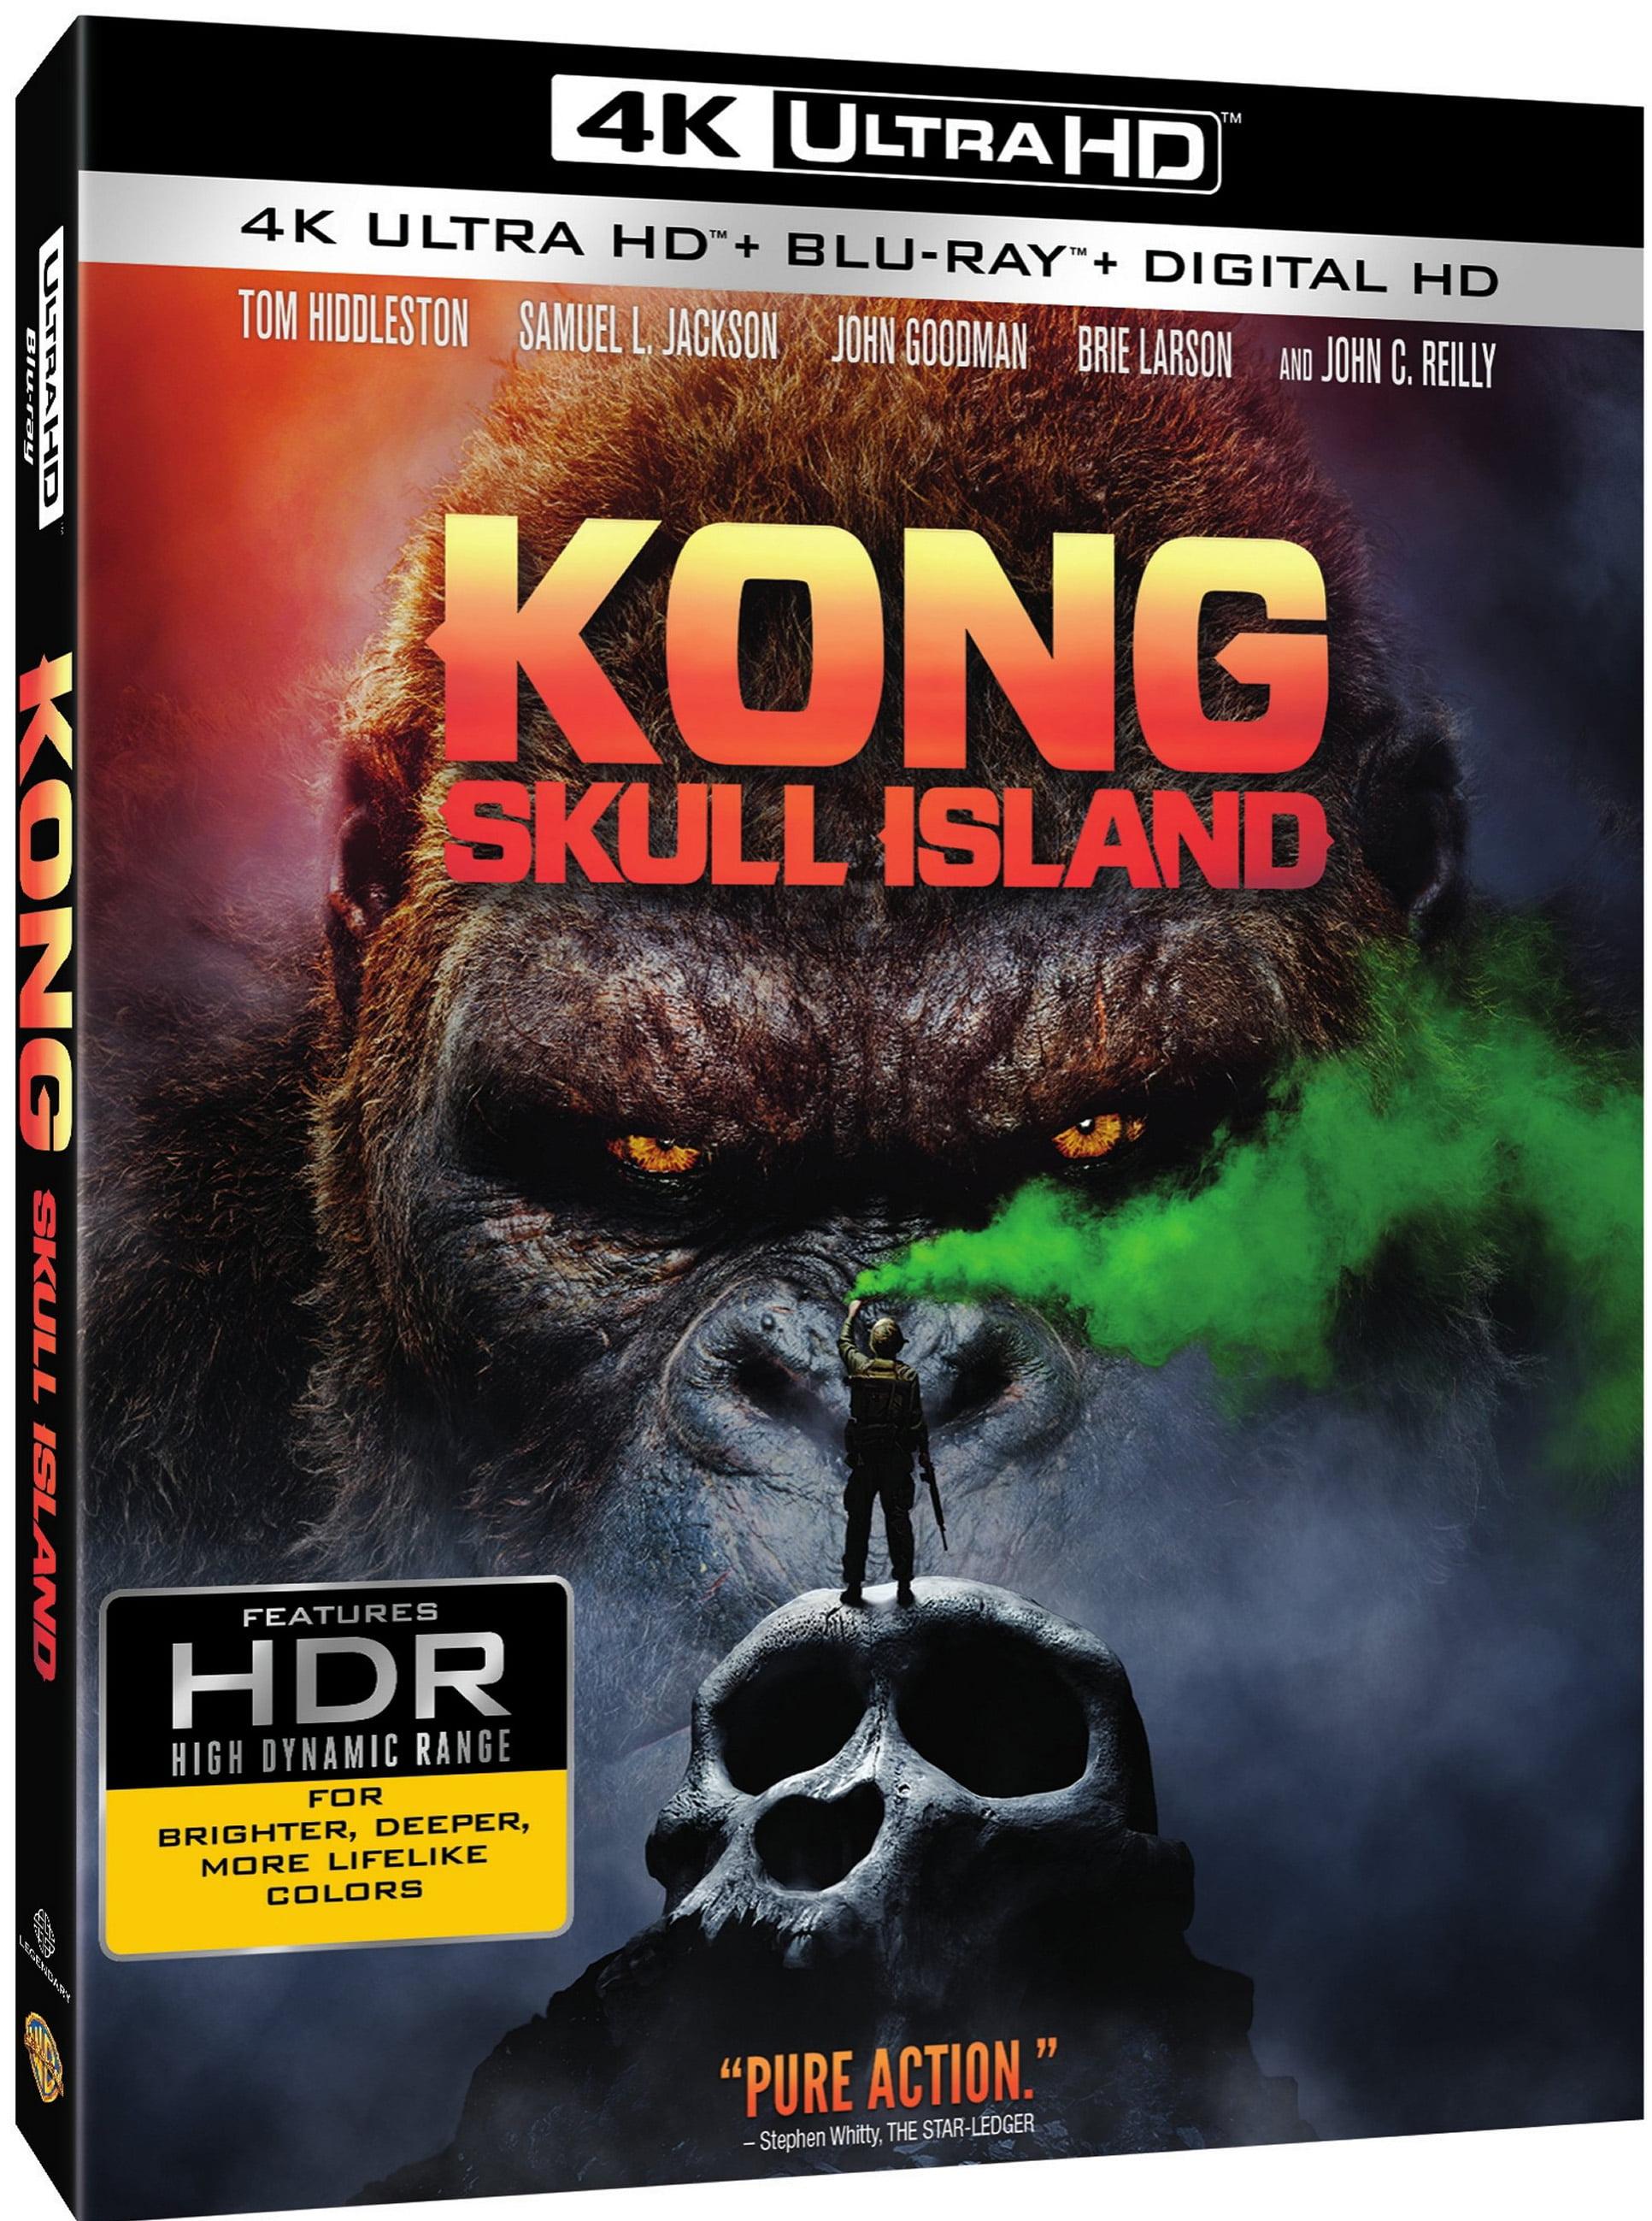 Kong: Skull Island (4K Ultra HD + Blu-ray + Digital HD) by